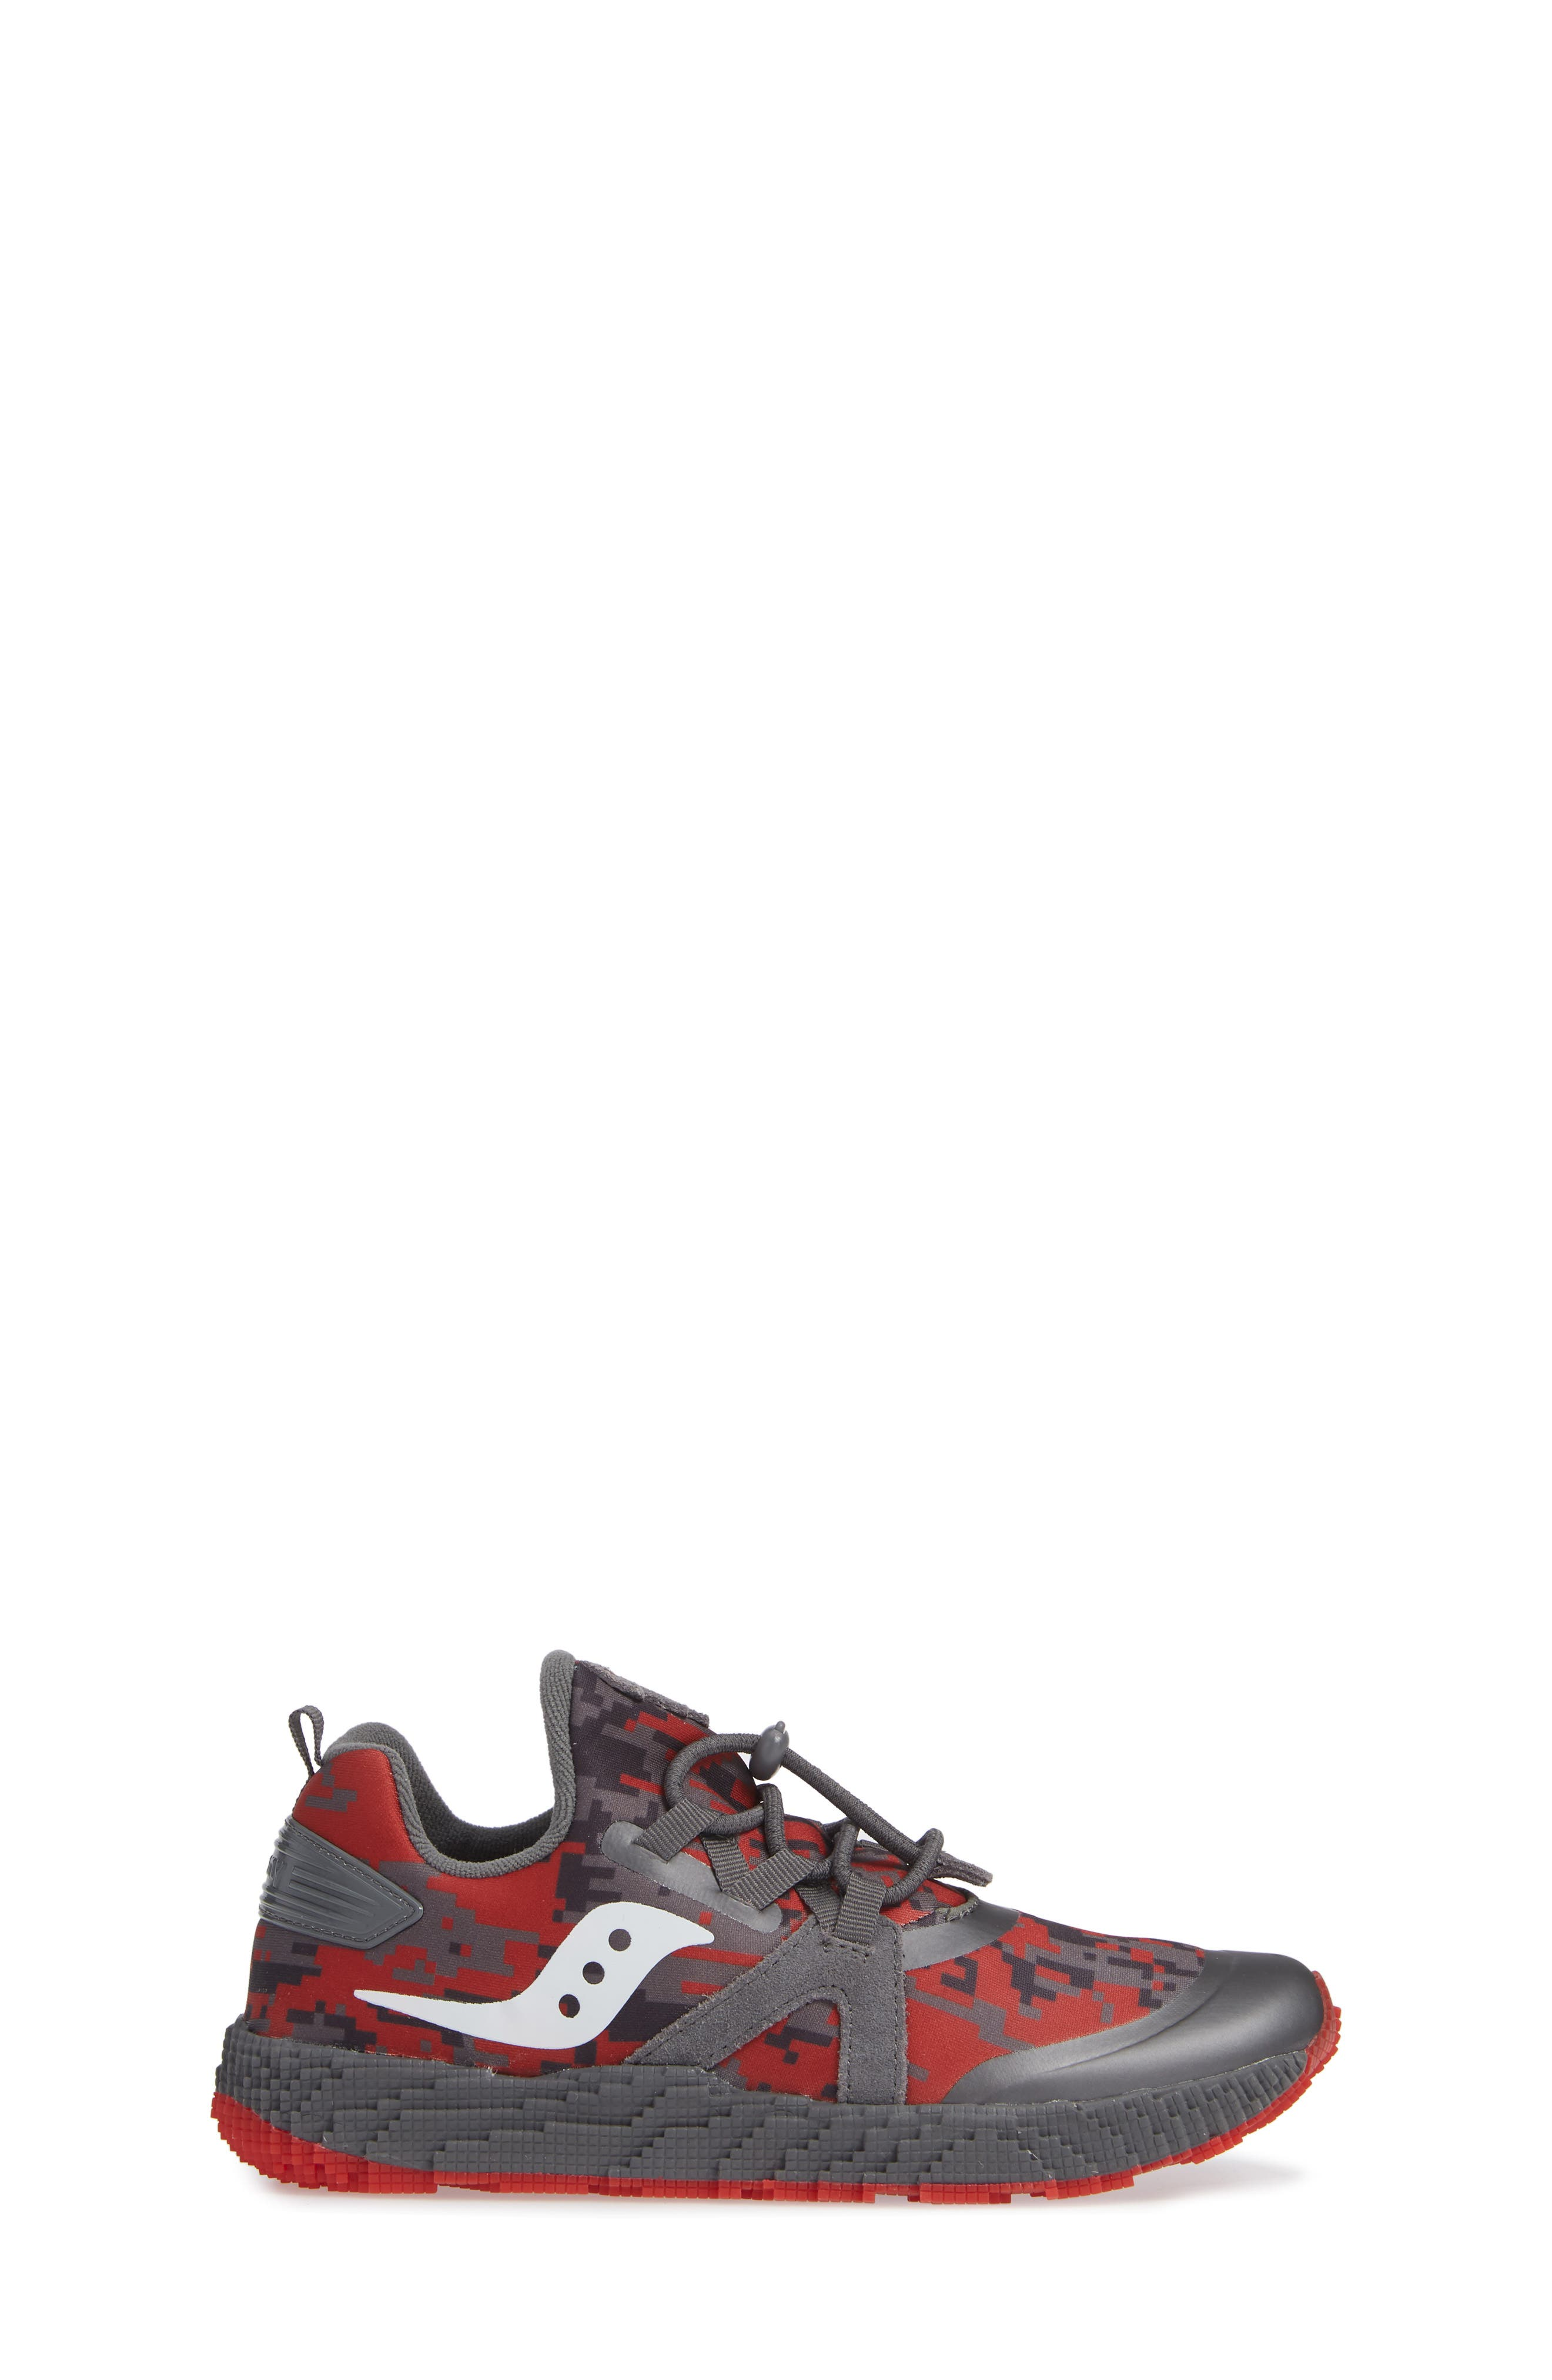 Voxel 9000 Sneaker,                             Alternate thumbnail 3, color,                             GREY LEATHER/ MESH 2